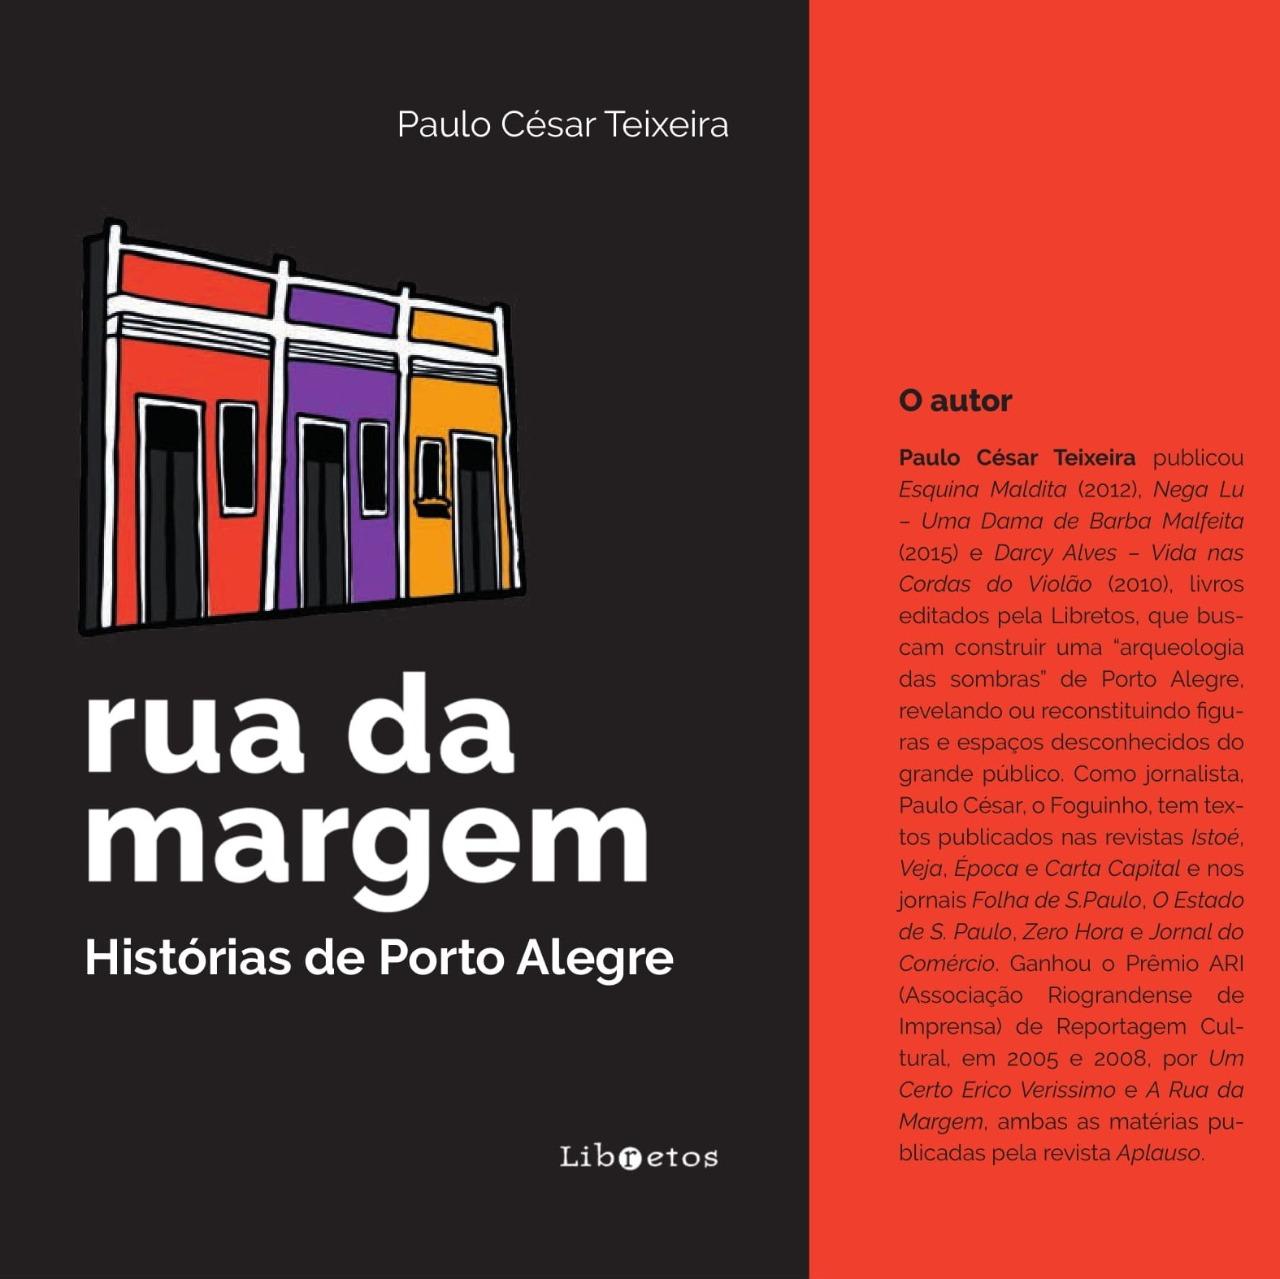 Rua da Margem